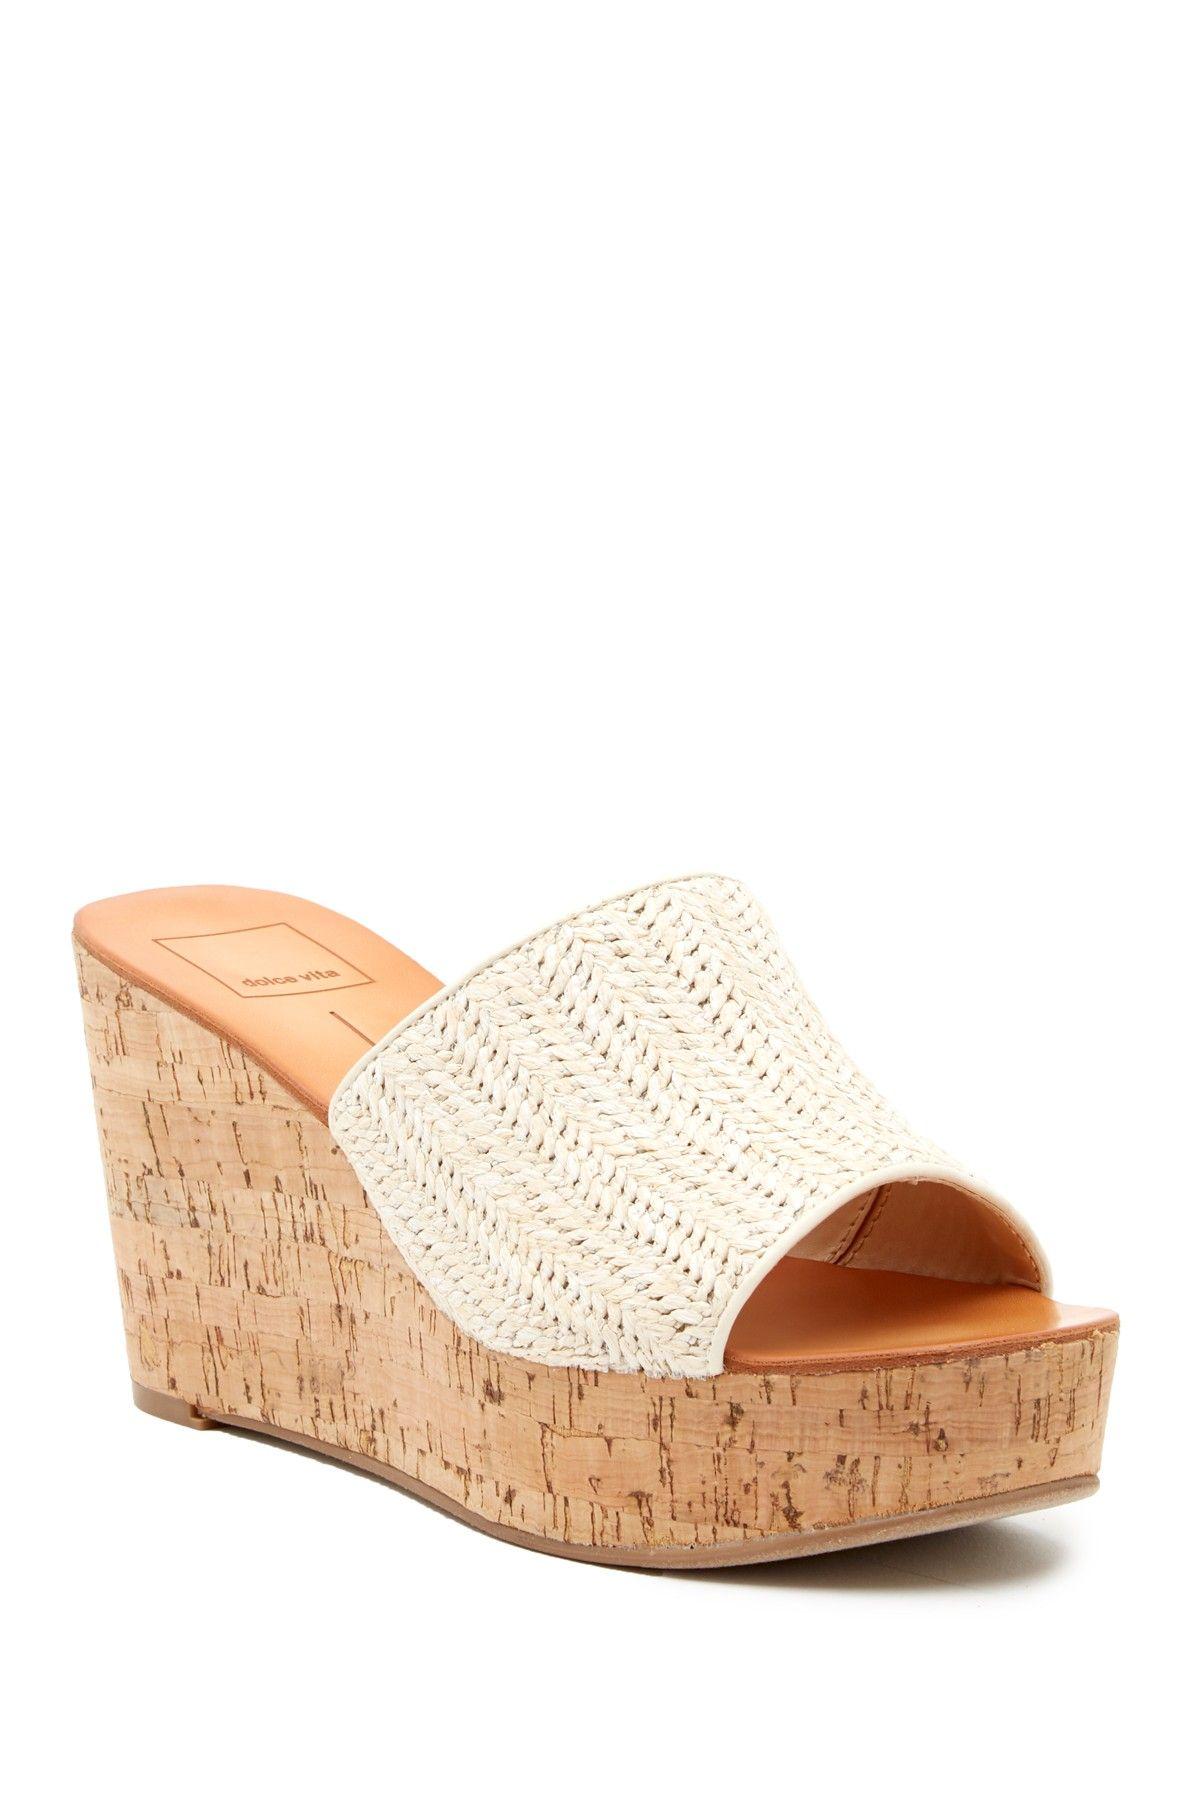 c00555be199 Dolce Vita Barkley Cork Wedge Sandal | Products | Wedge sandals ...